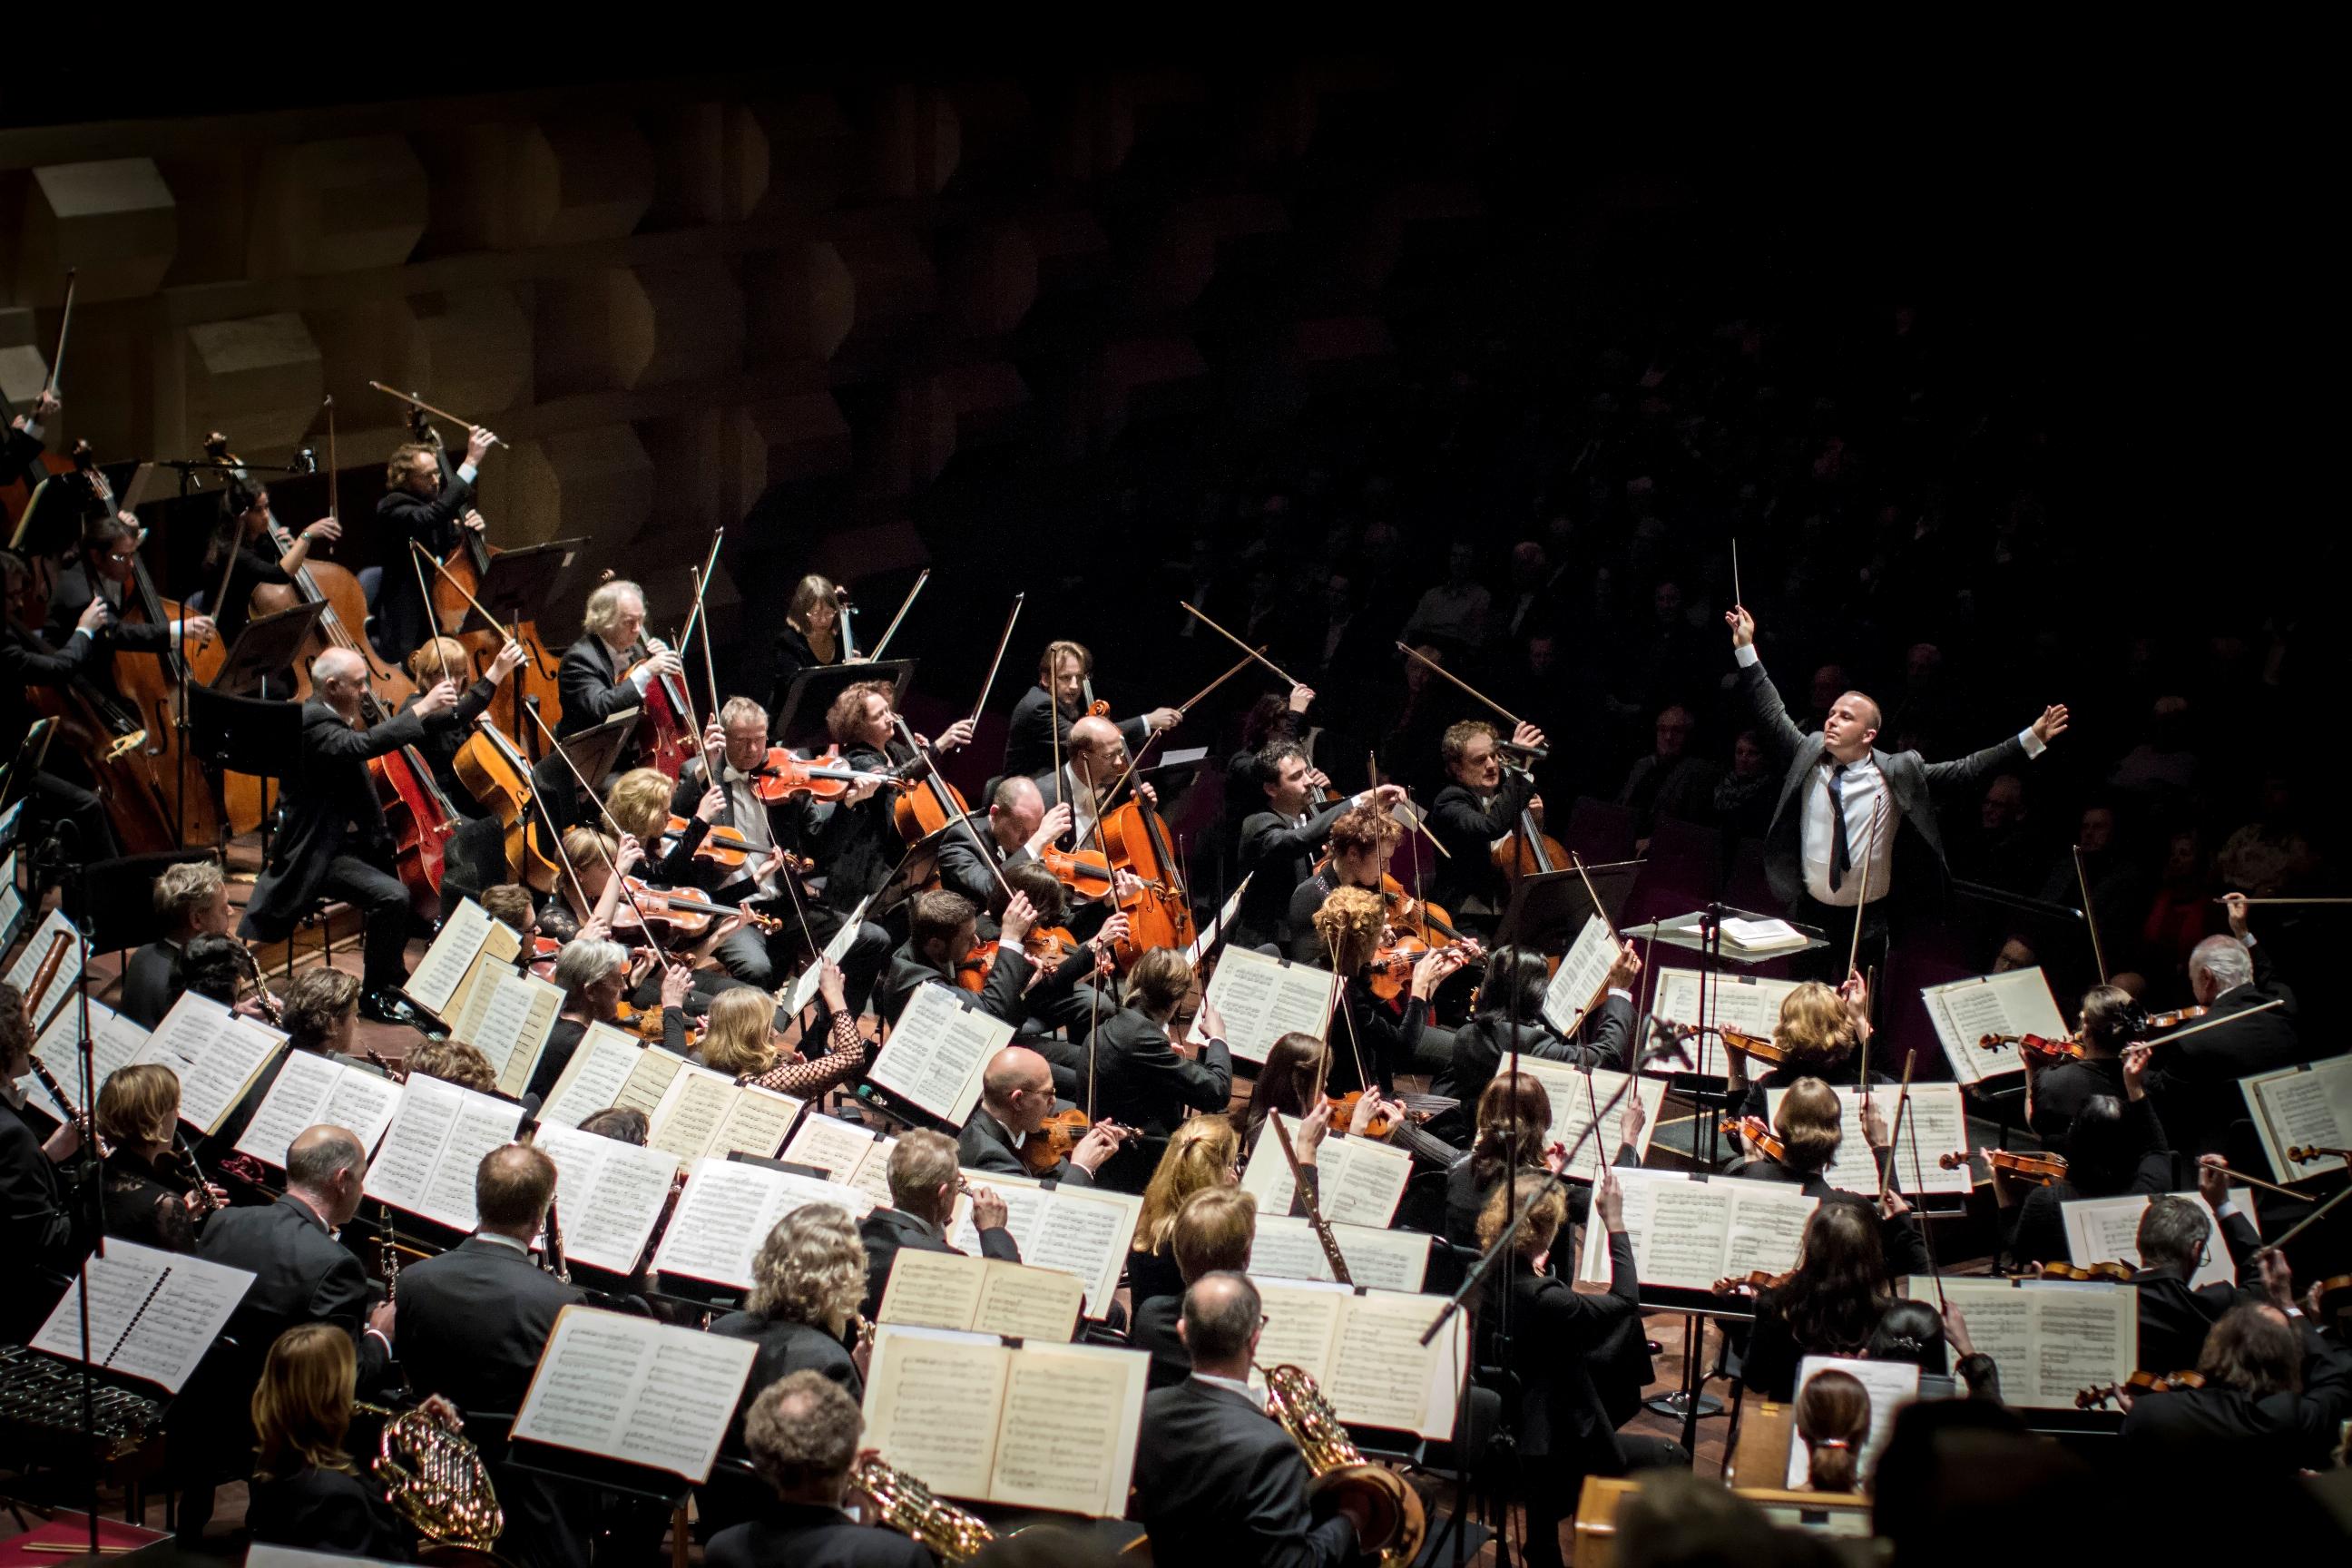 Rotterdam_Philharmonic,_jan_2012_-_2_(c)_Hans_van_der_Woerd